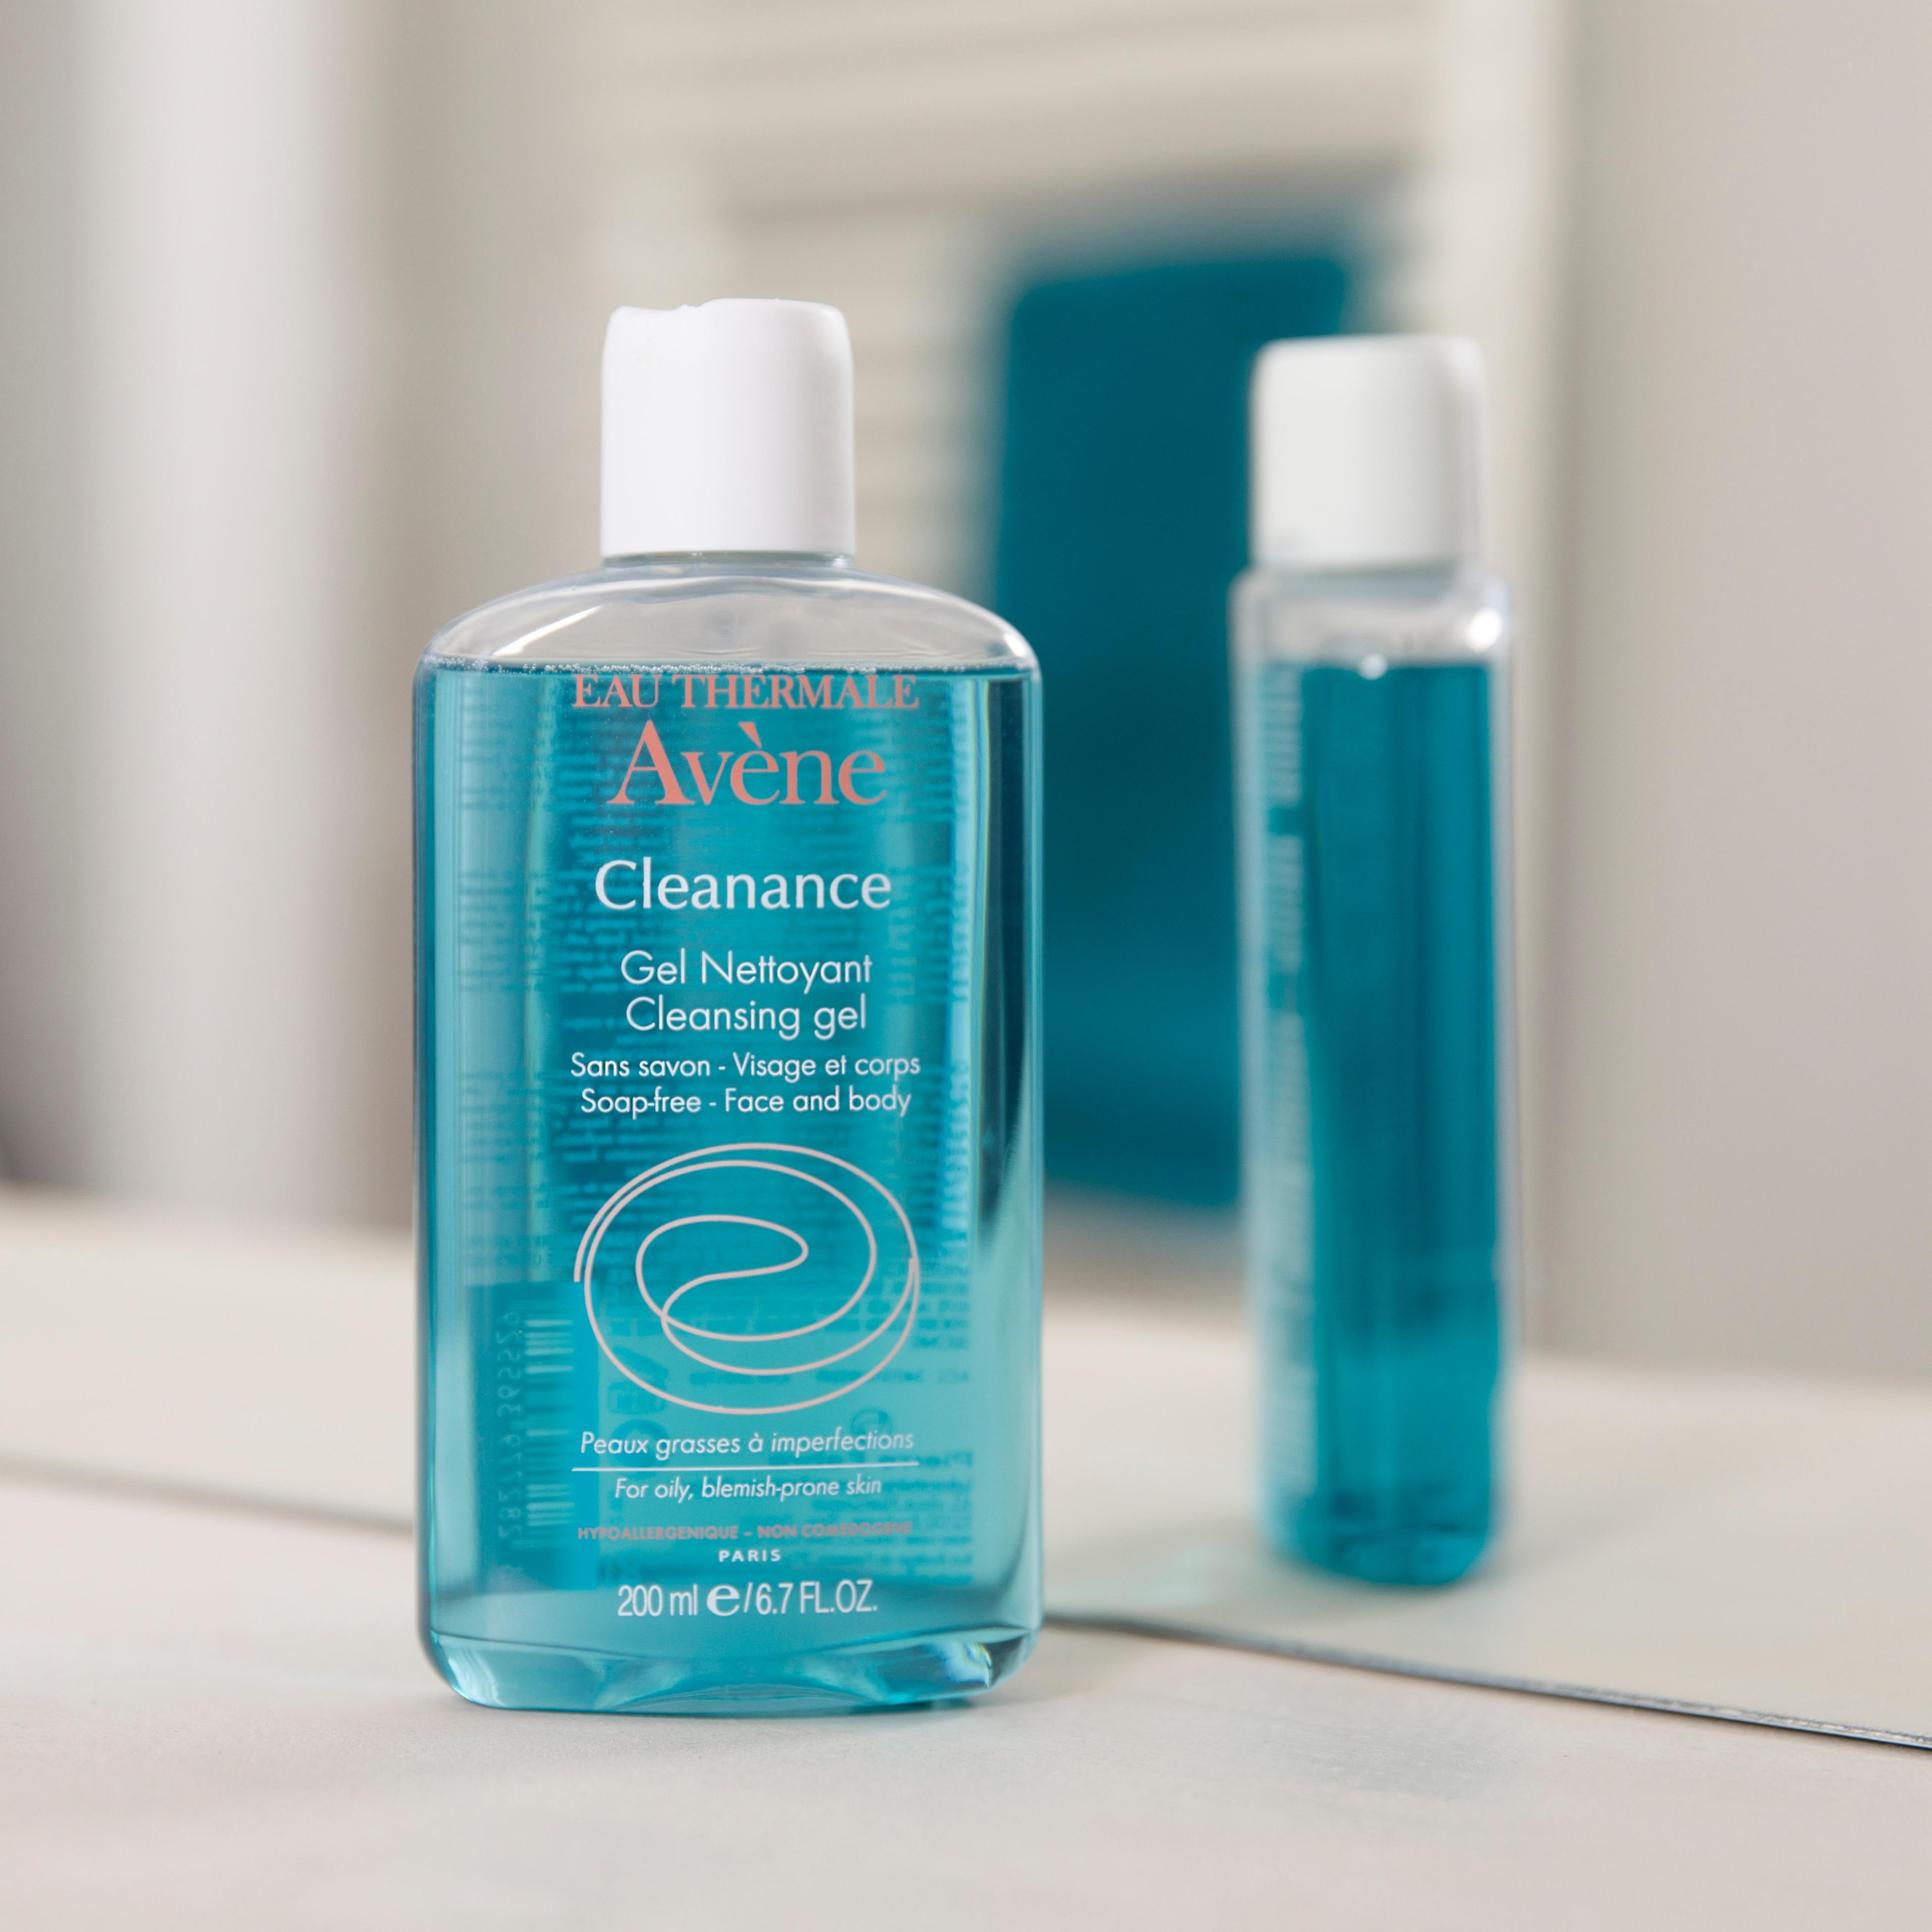 Eau Thermale Avène - Cleanance